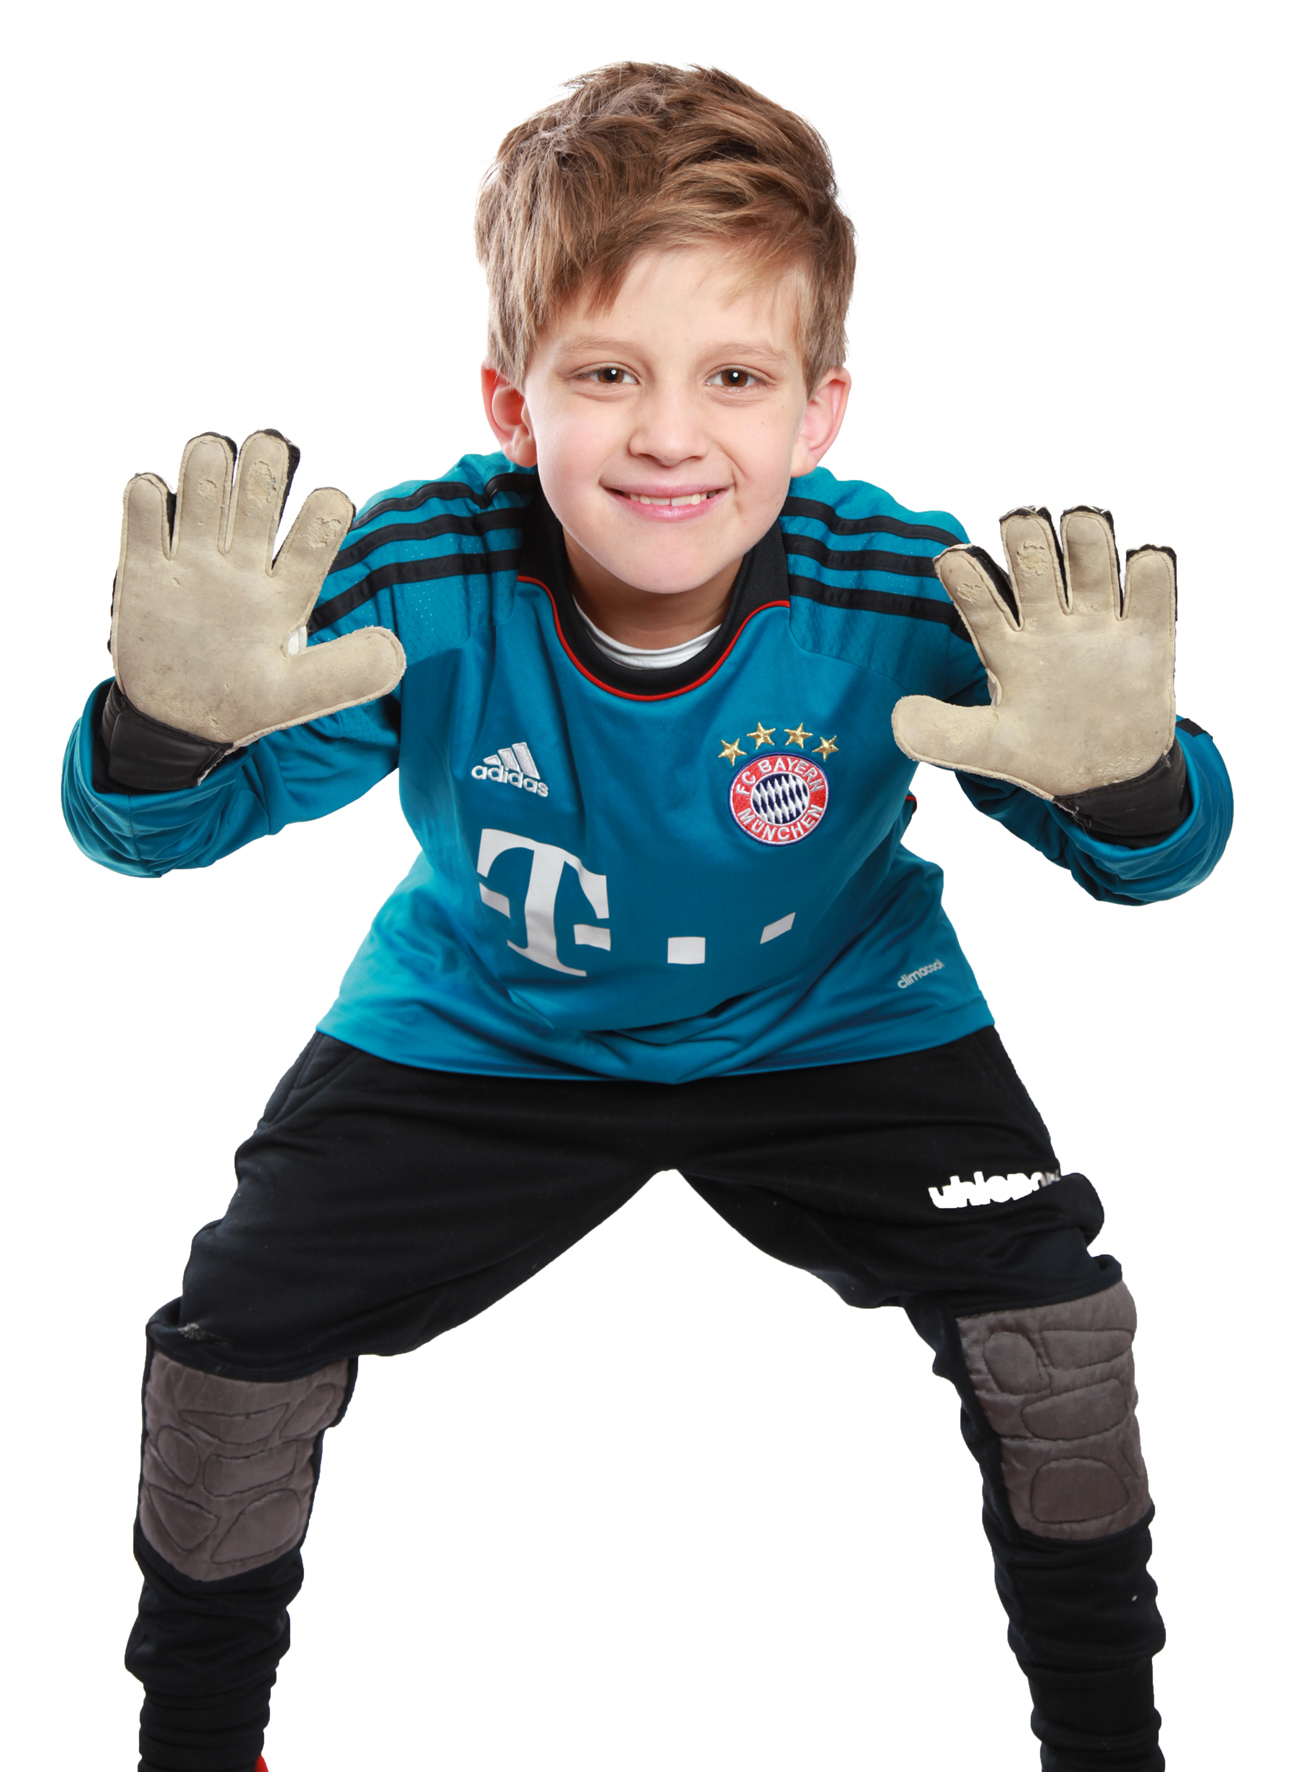 Bundesverband Neurofibromatose Kind Lebensgeschichte Story Selbsthilfe